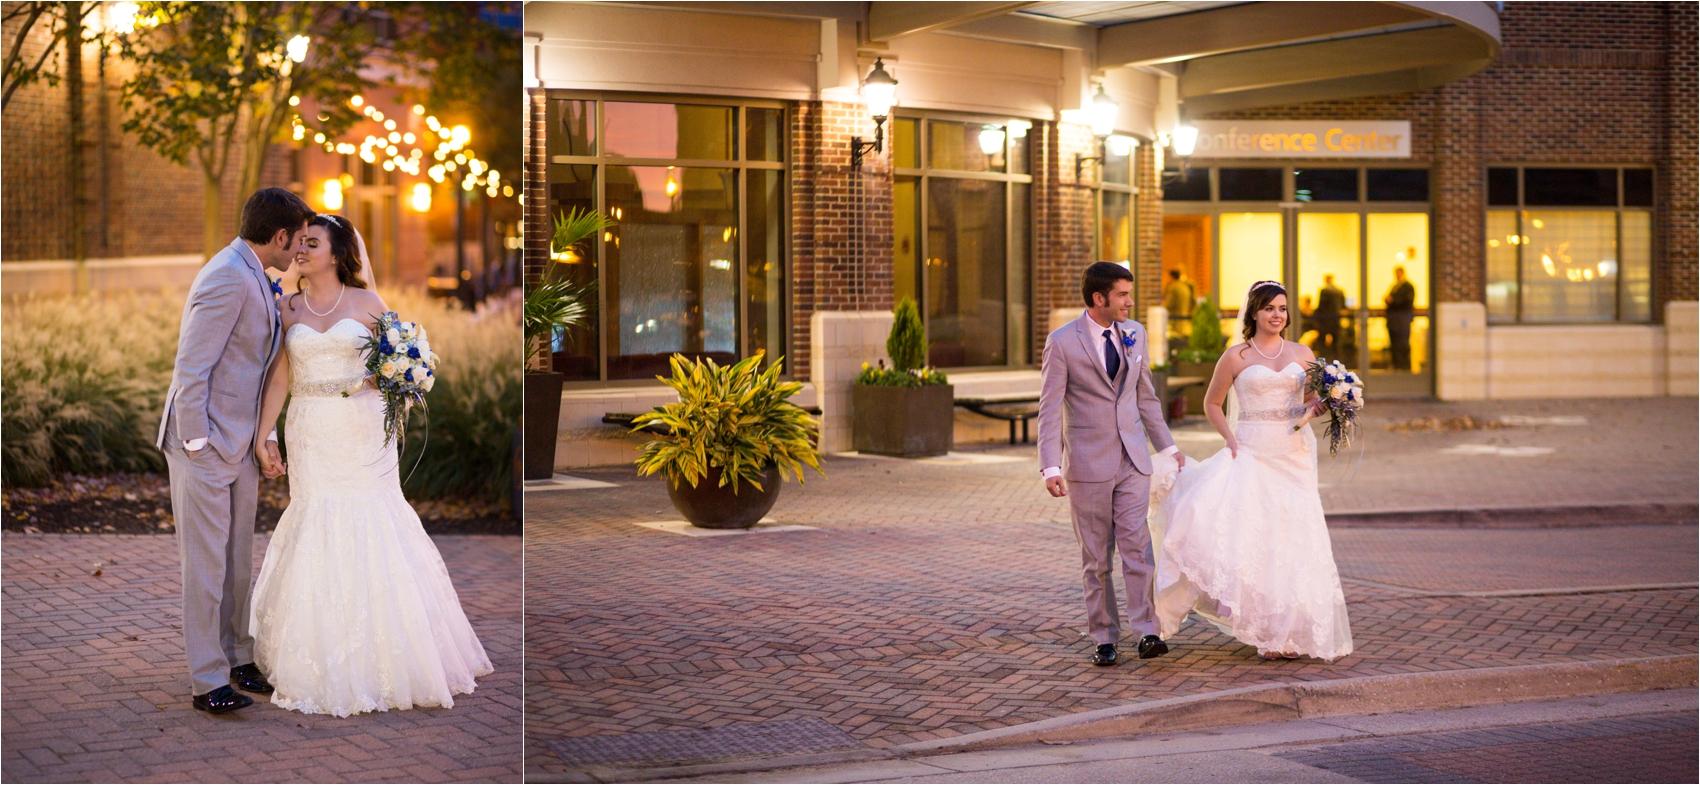 Newport-News-Winter-Wonderland-Wedding_0199.jpg